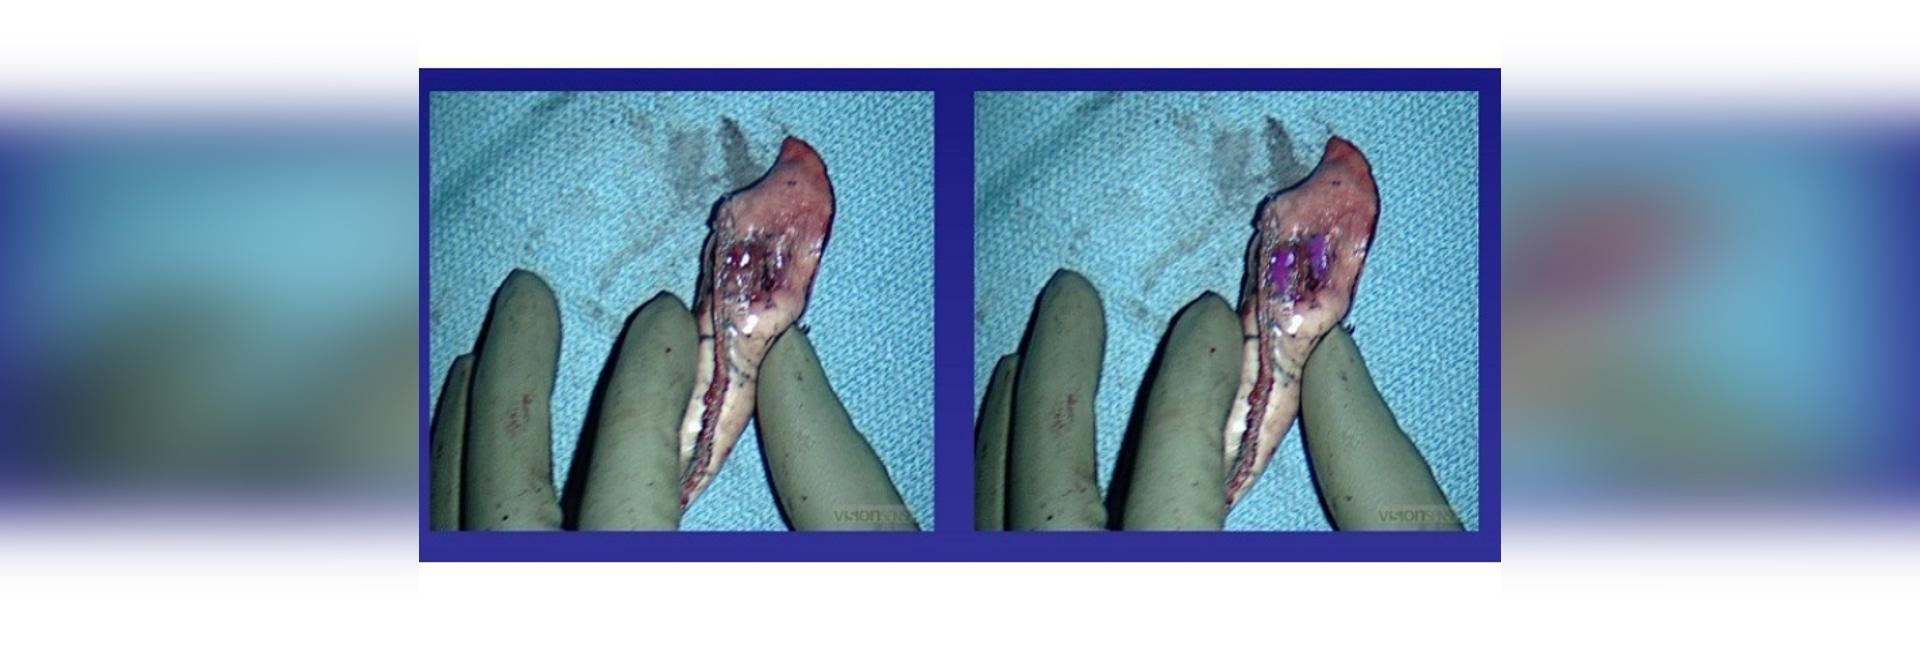 Margin assessment using white light (left) versus intraoperative molecular imaging with OTL38 (right)